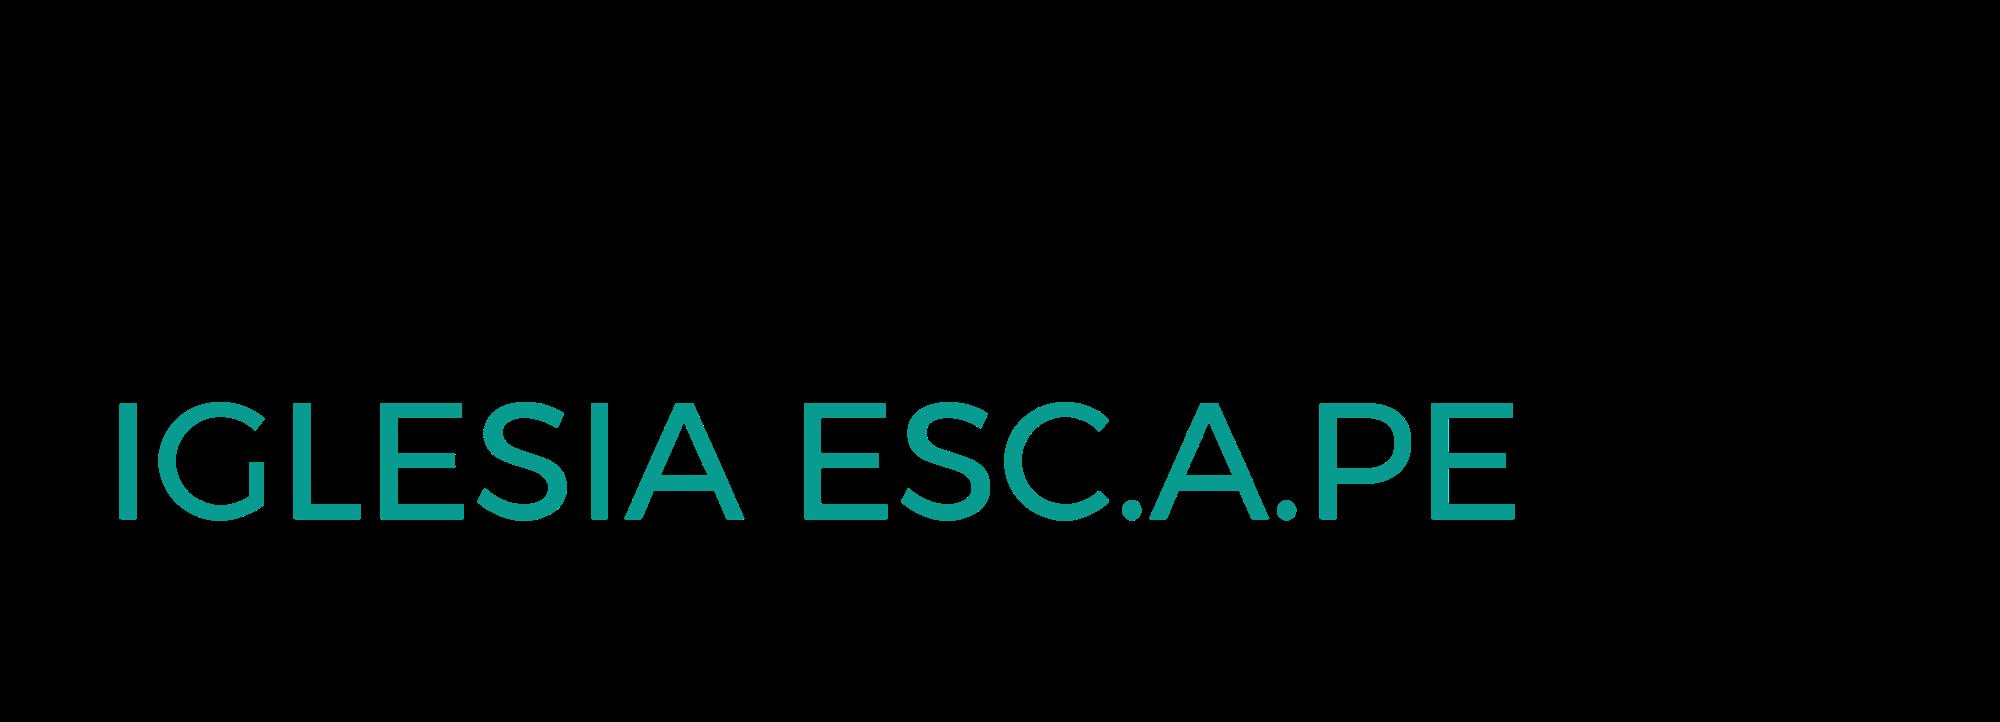 IGLESIA ESC.A.PE-logo (1).png